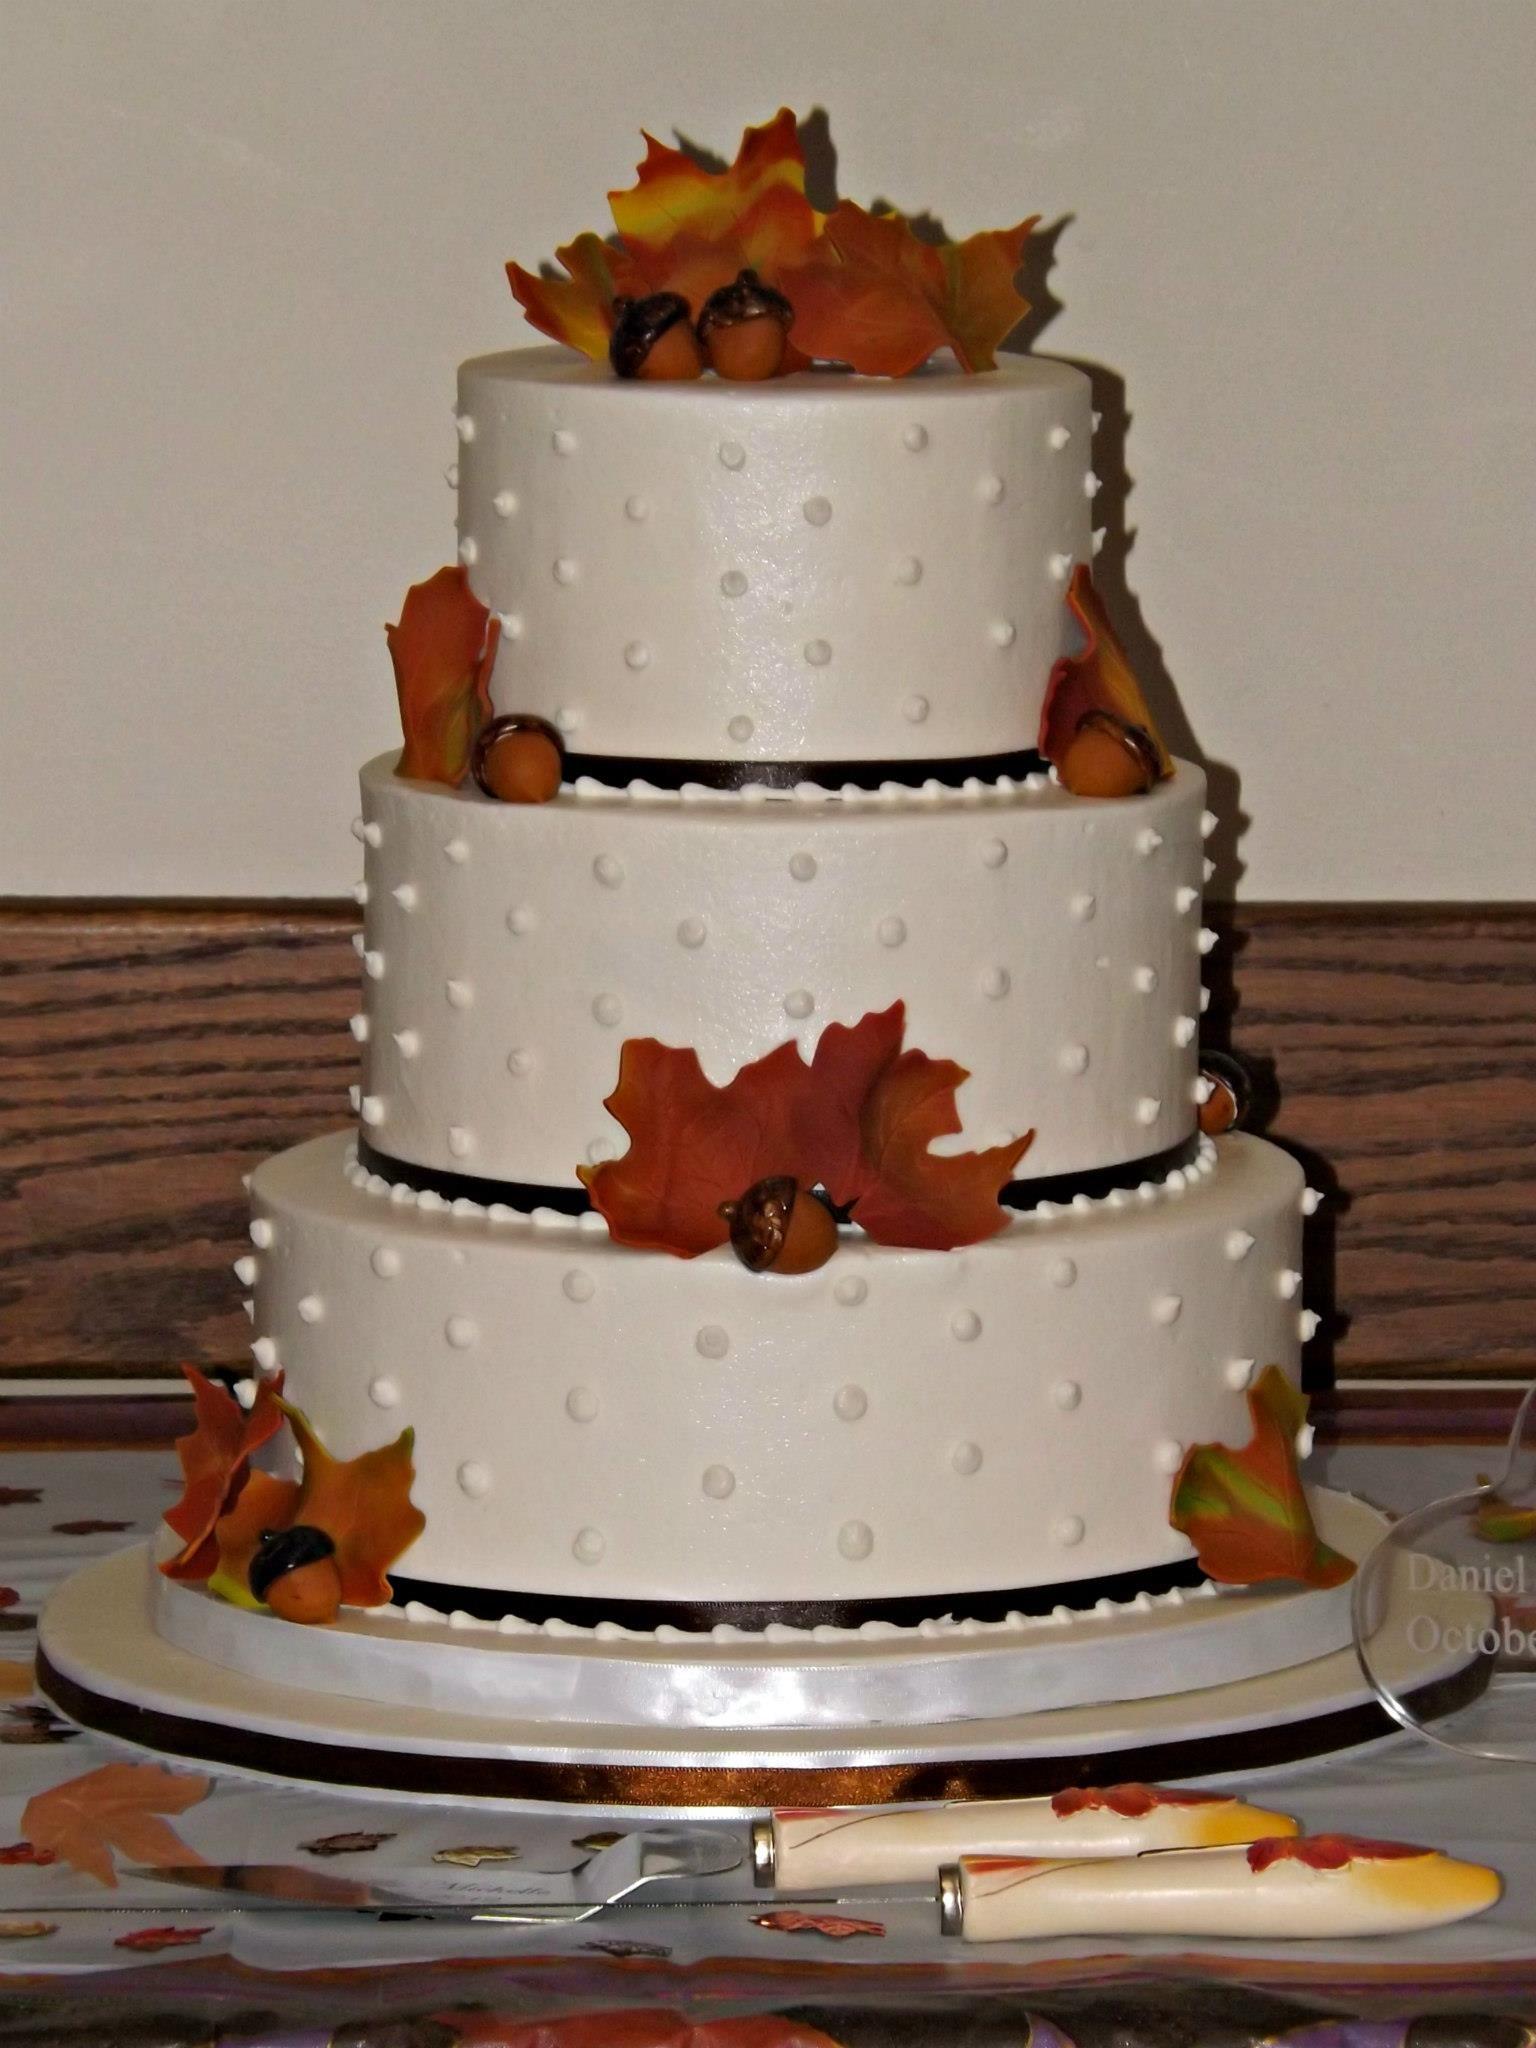 Fall Themed Buttercream Wedding Cake Wicked Wedding Cakes - Wicked Wedding Cakes